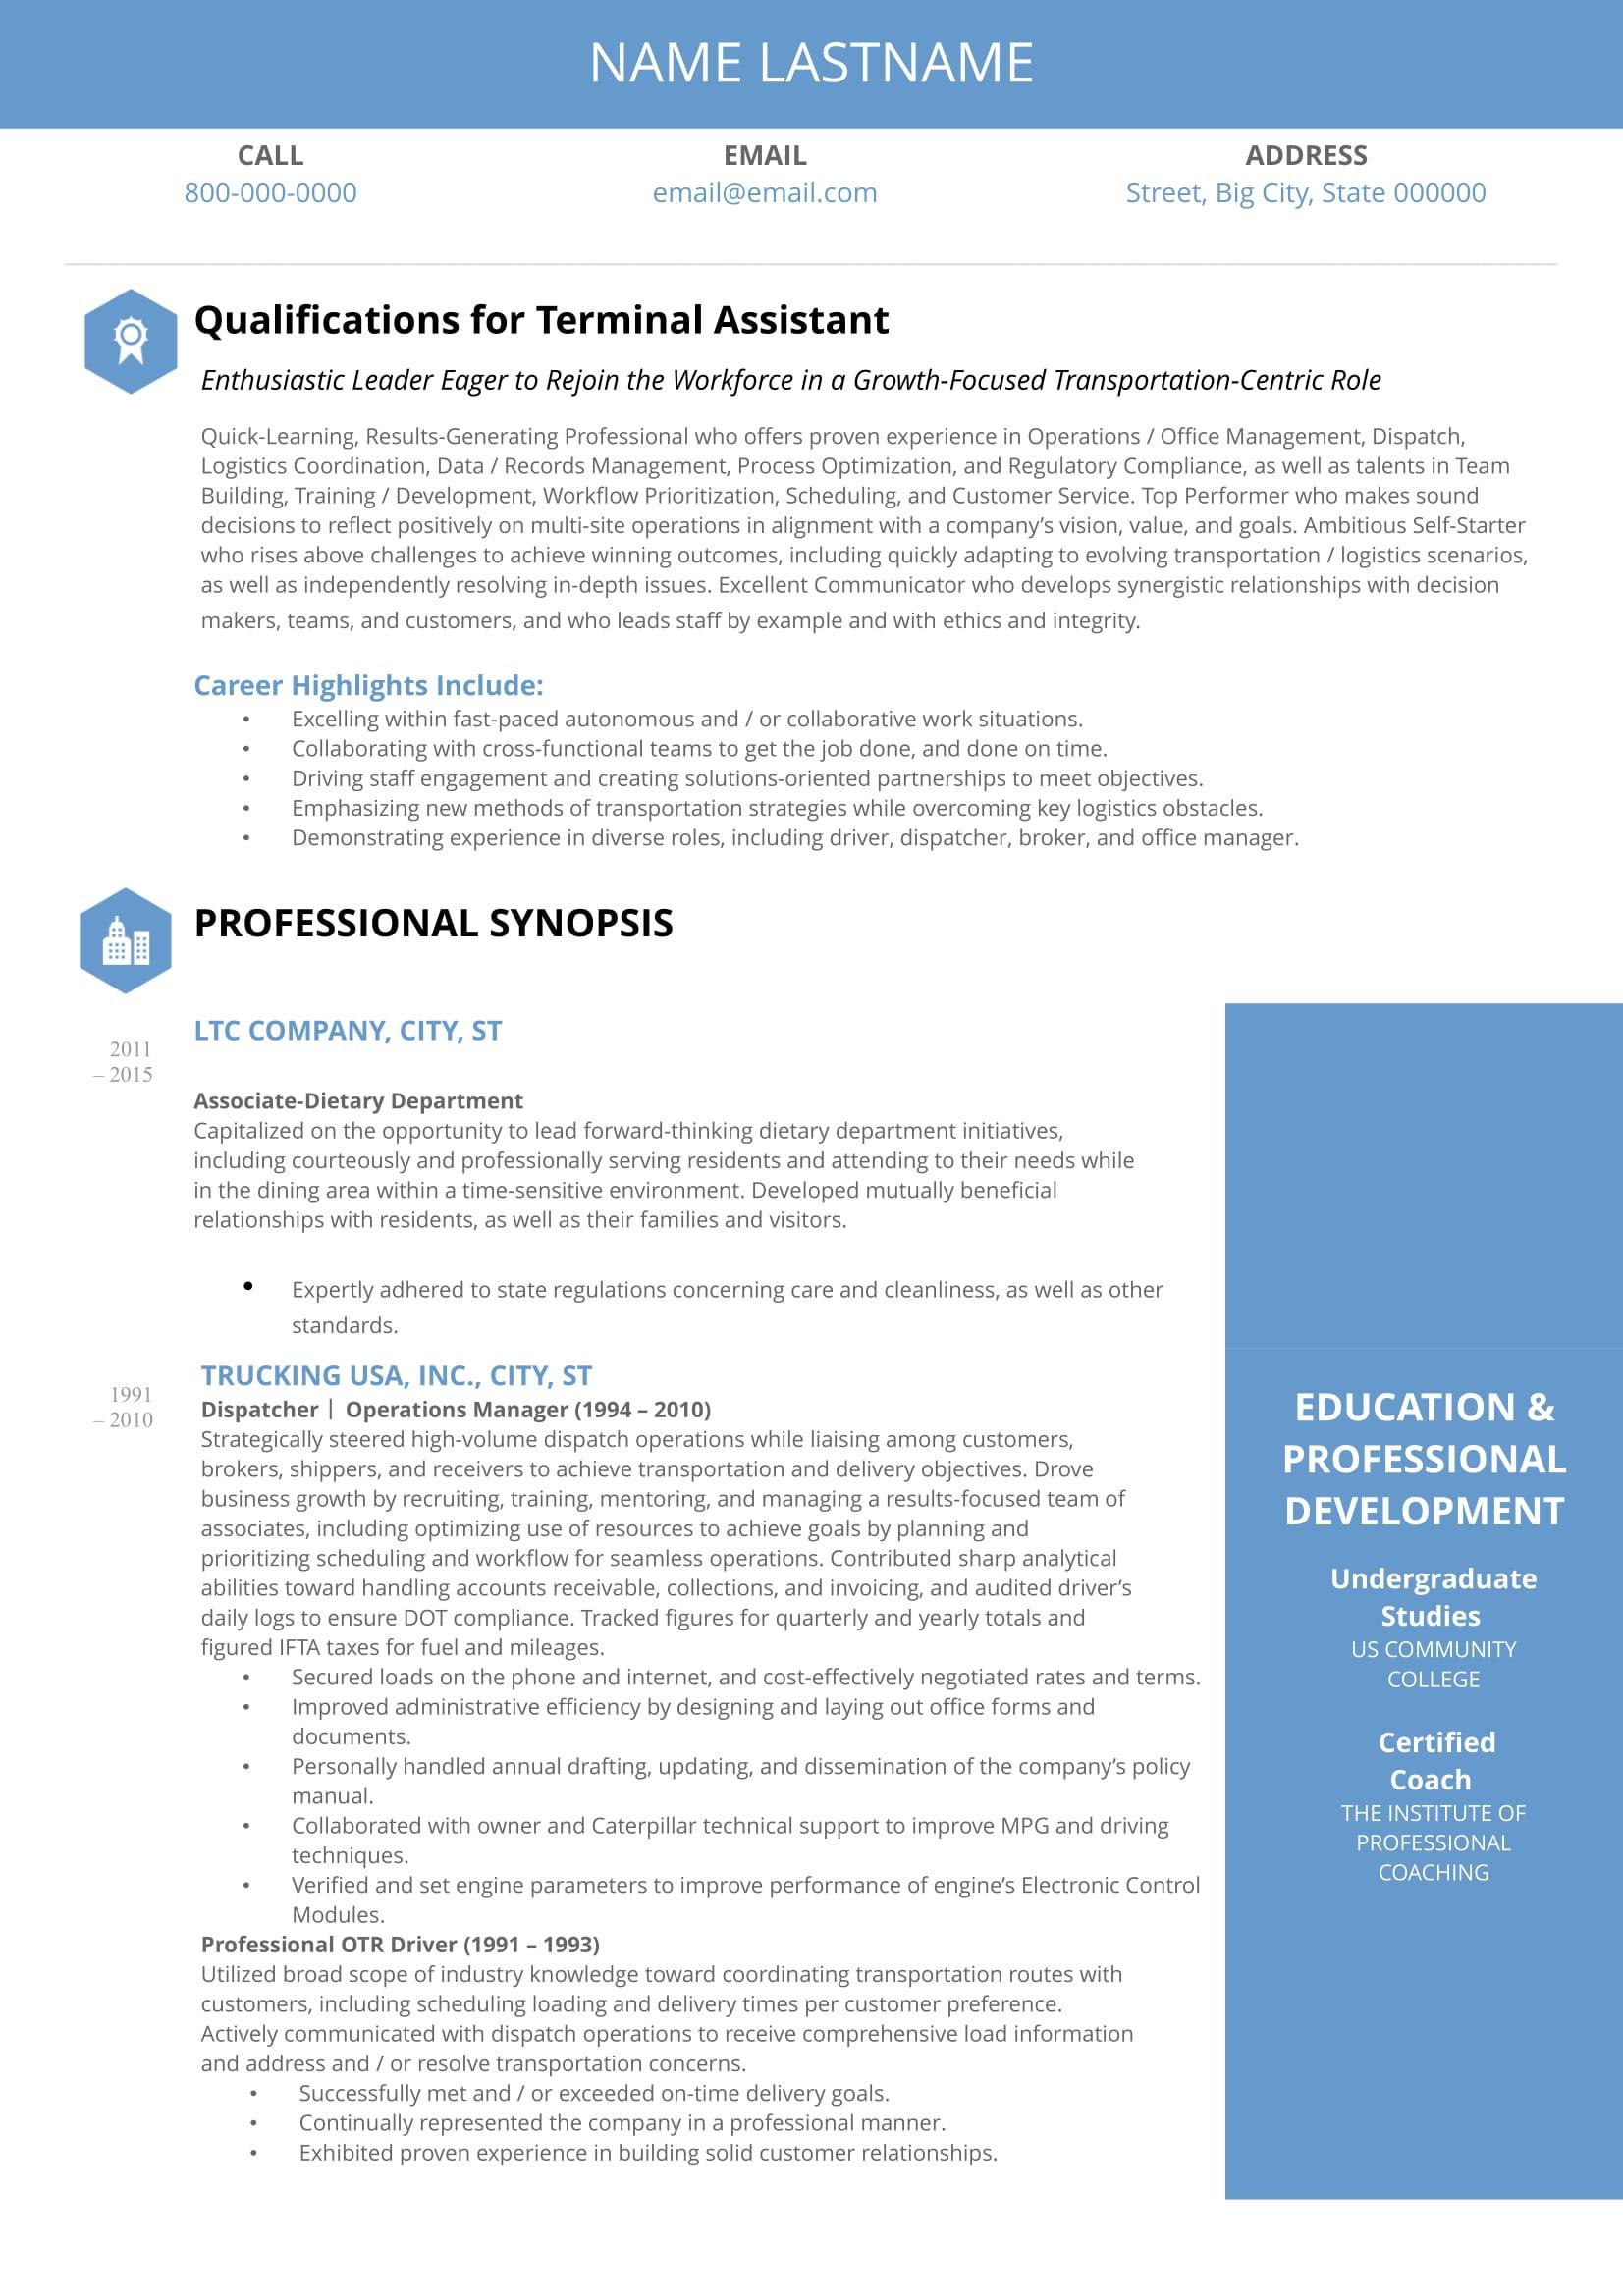 Professional Resume   Sample #2